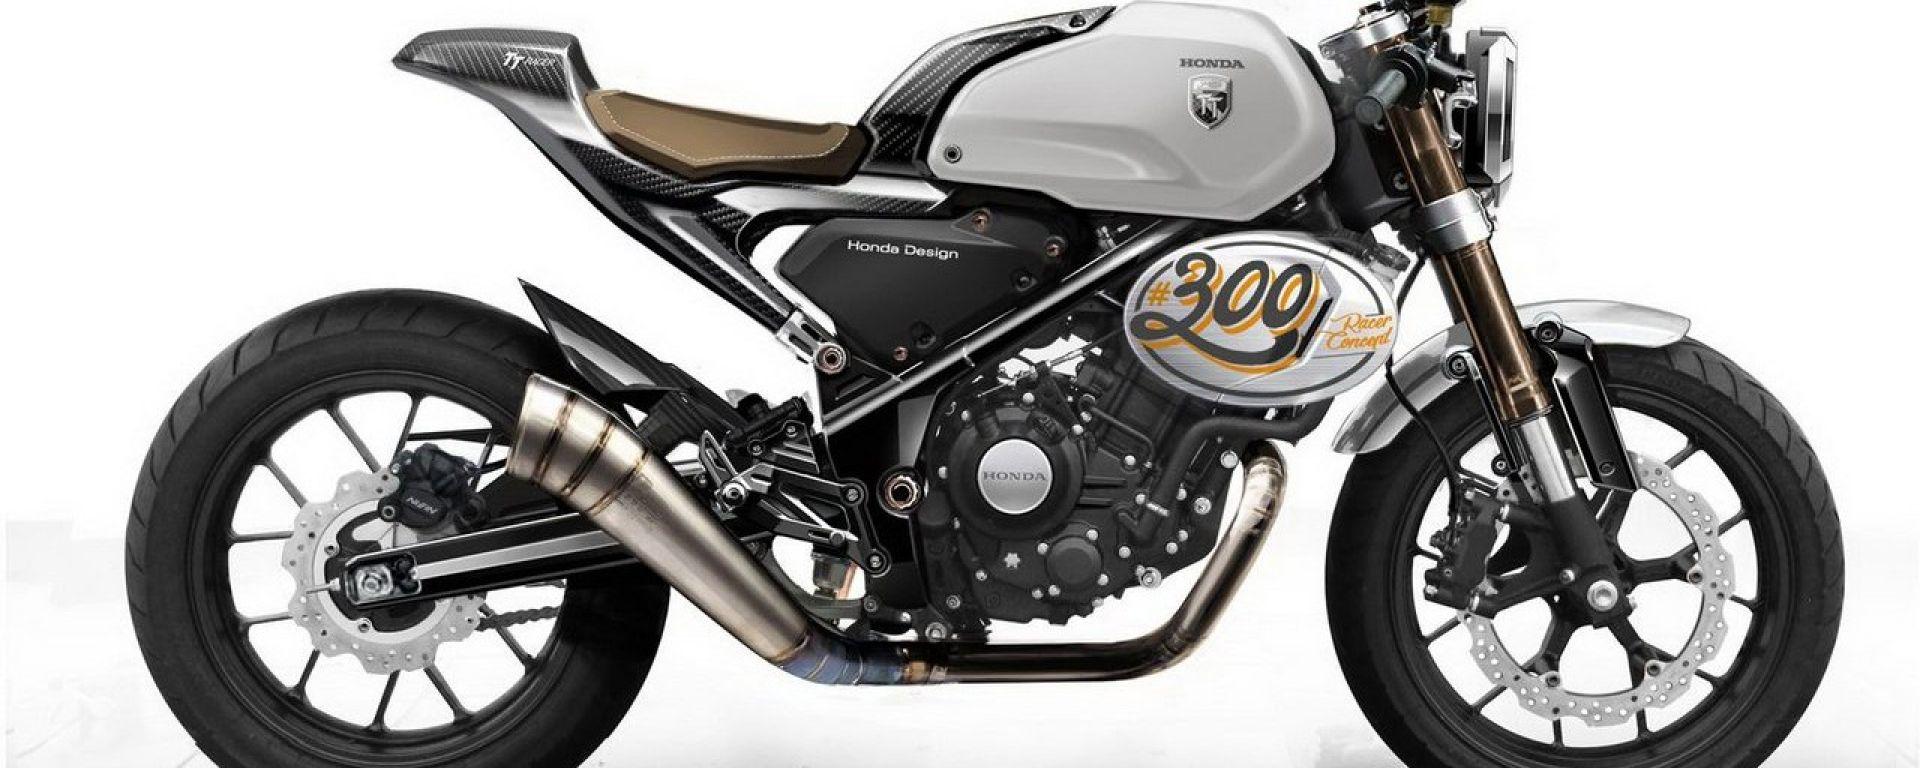 Honda CB300 TT Racer Concept